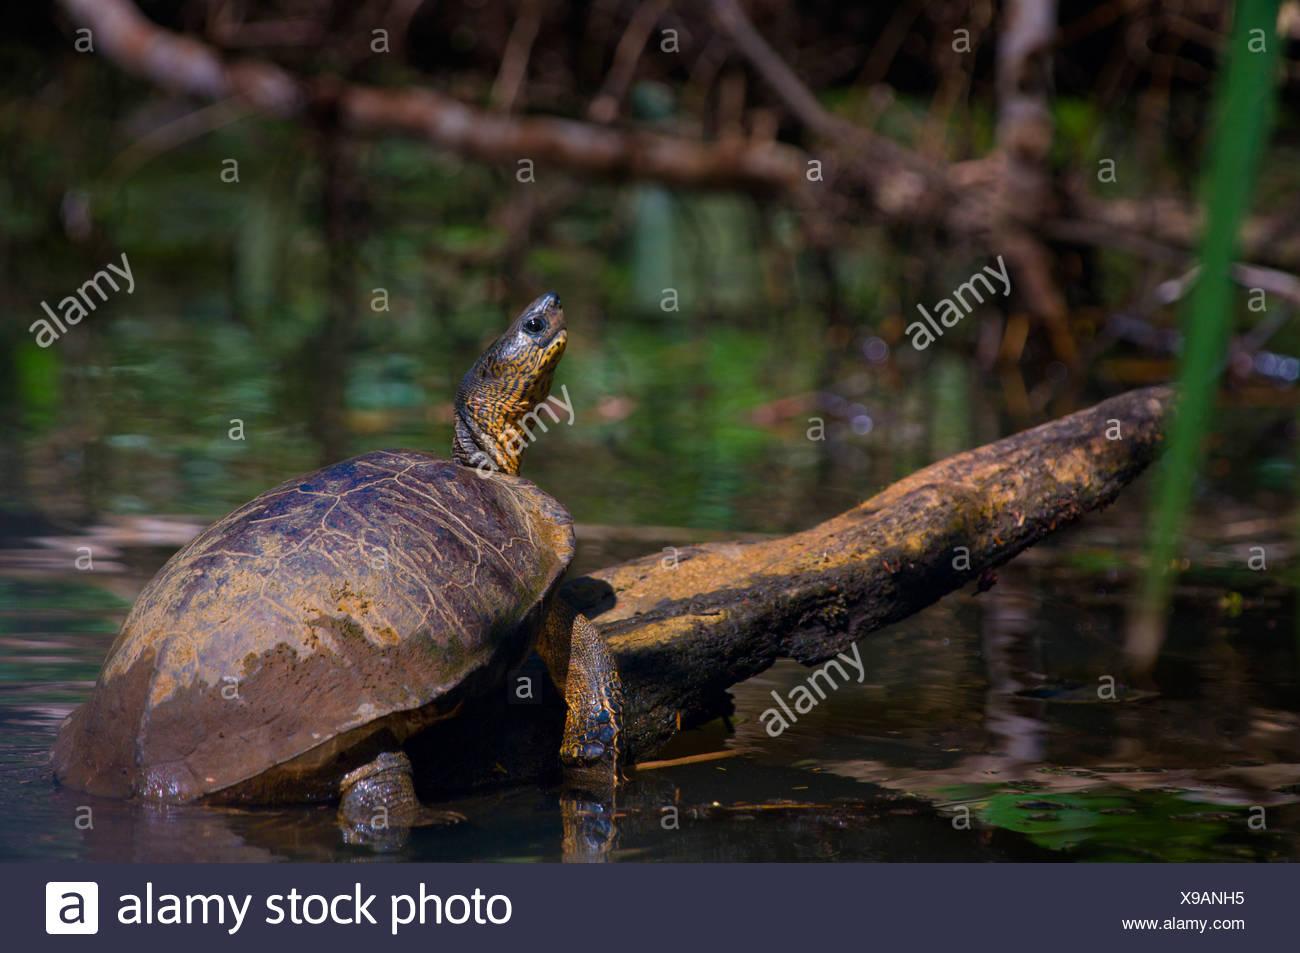 Black River Turtle (Rhinoclemmys funerea) - Stock Image